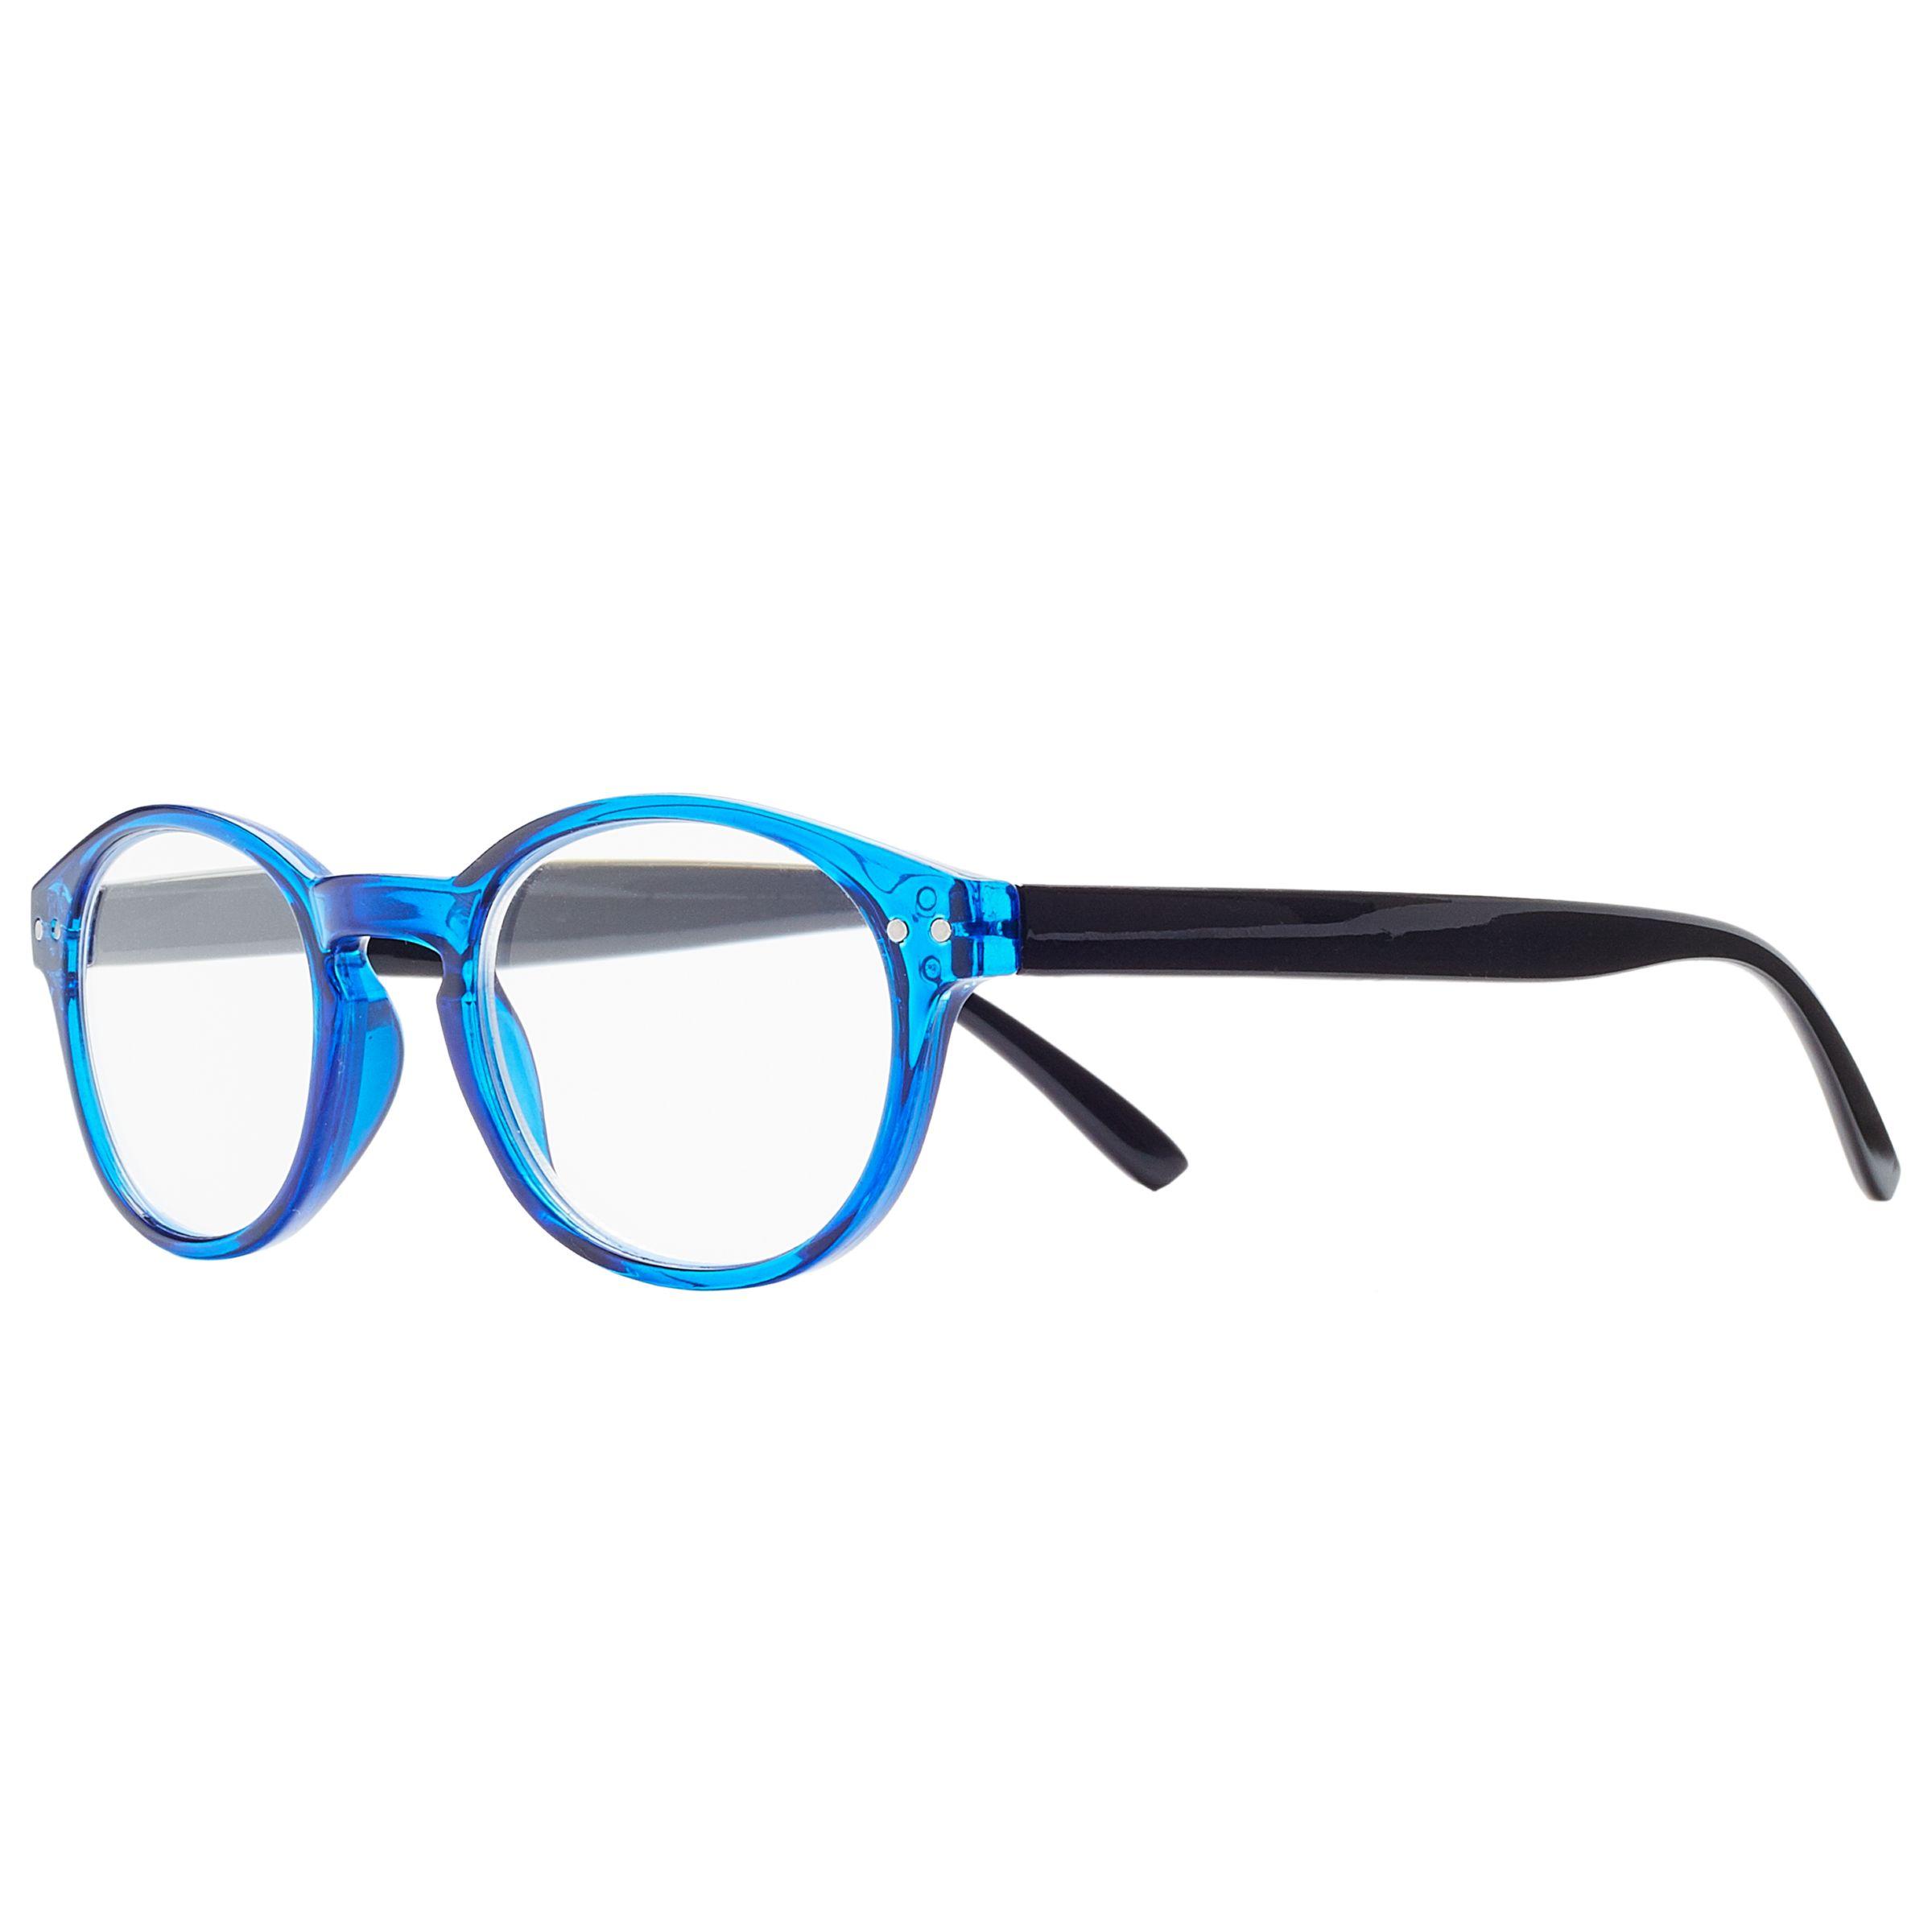 Magnif Eyes Magnif Eyes Ready Readers St Louis Glasses, Cobalt/Black